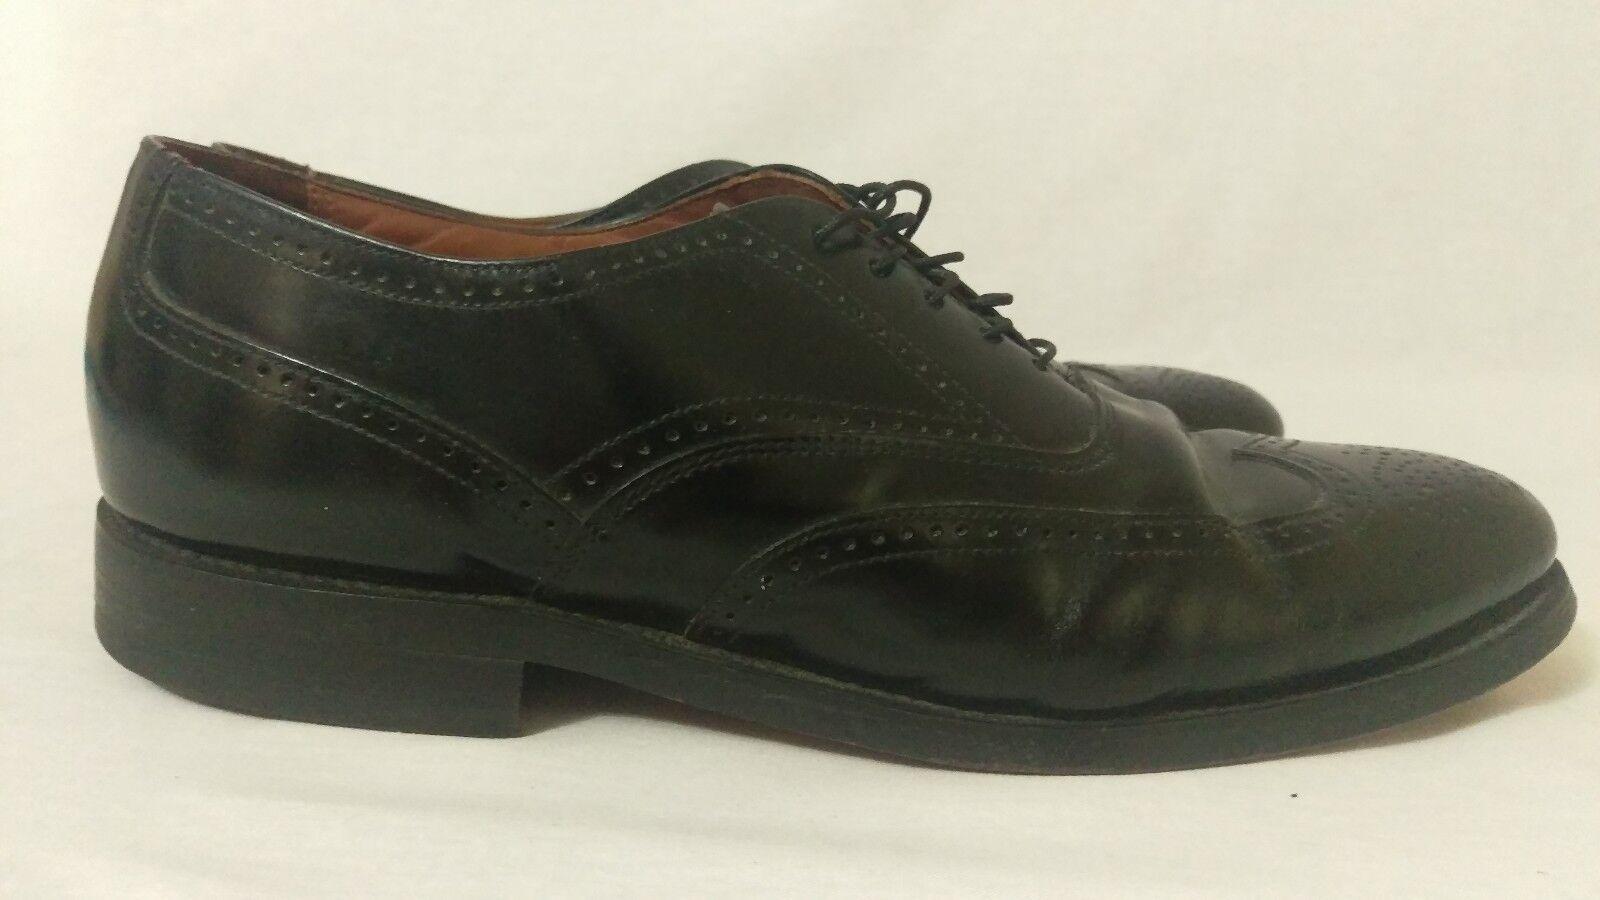 Bostonian Classics shoes Dress Wingtip Oxford Black Mens Size 10 D B